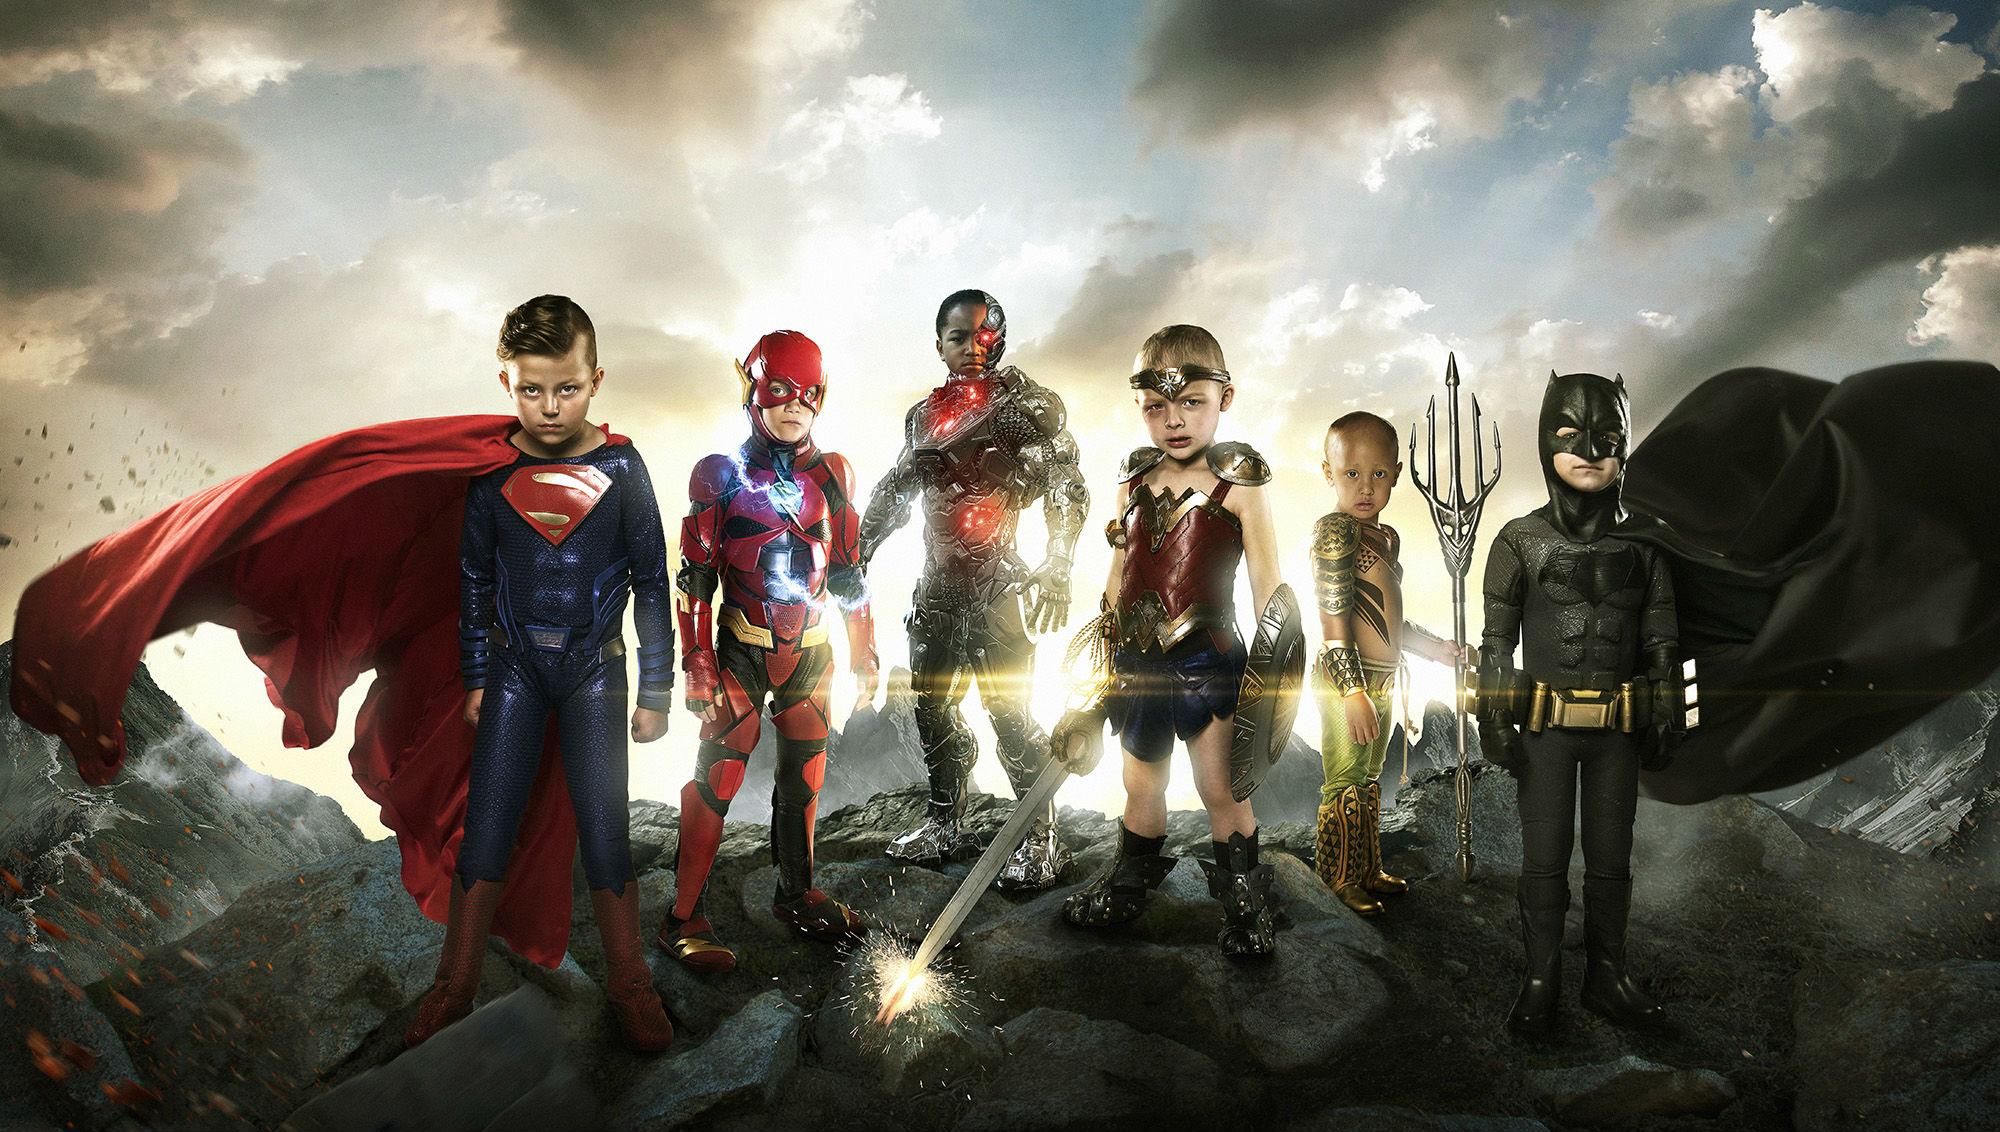 Justice League 2017 Movie 4k Hd Desktop Wallpaper For 4k: Justice League Small Heroes, HD Movies, 4k Wallpapers